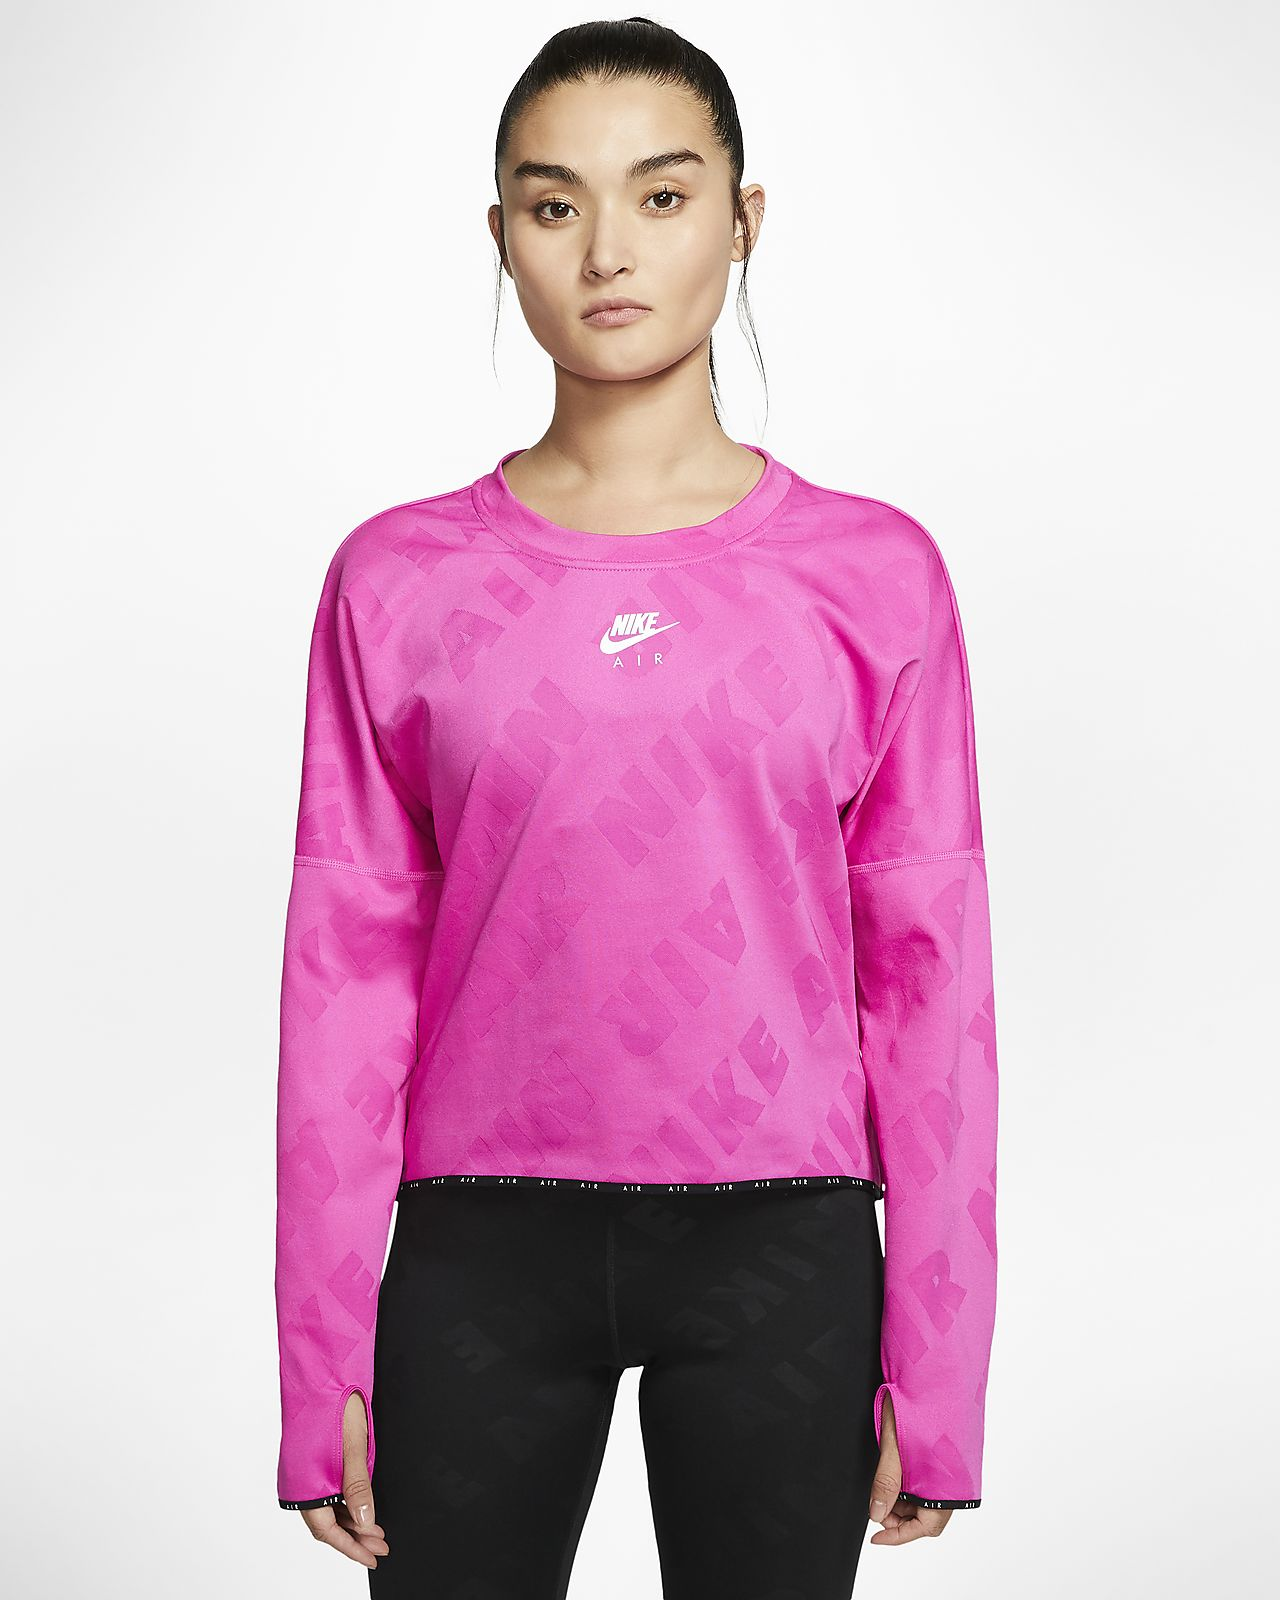 Nike Air Women's Long-Sleeve Running Top